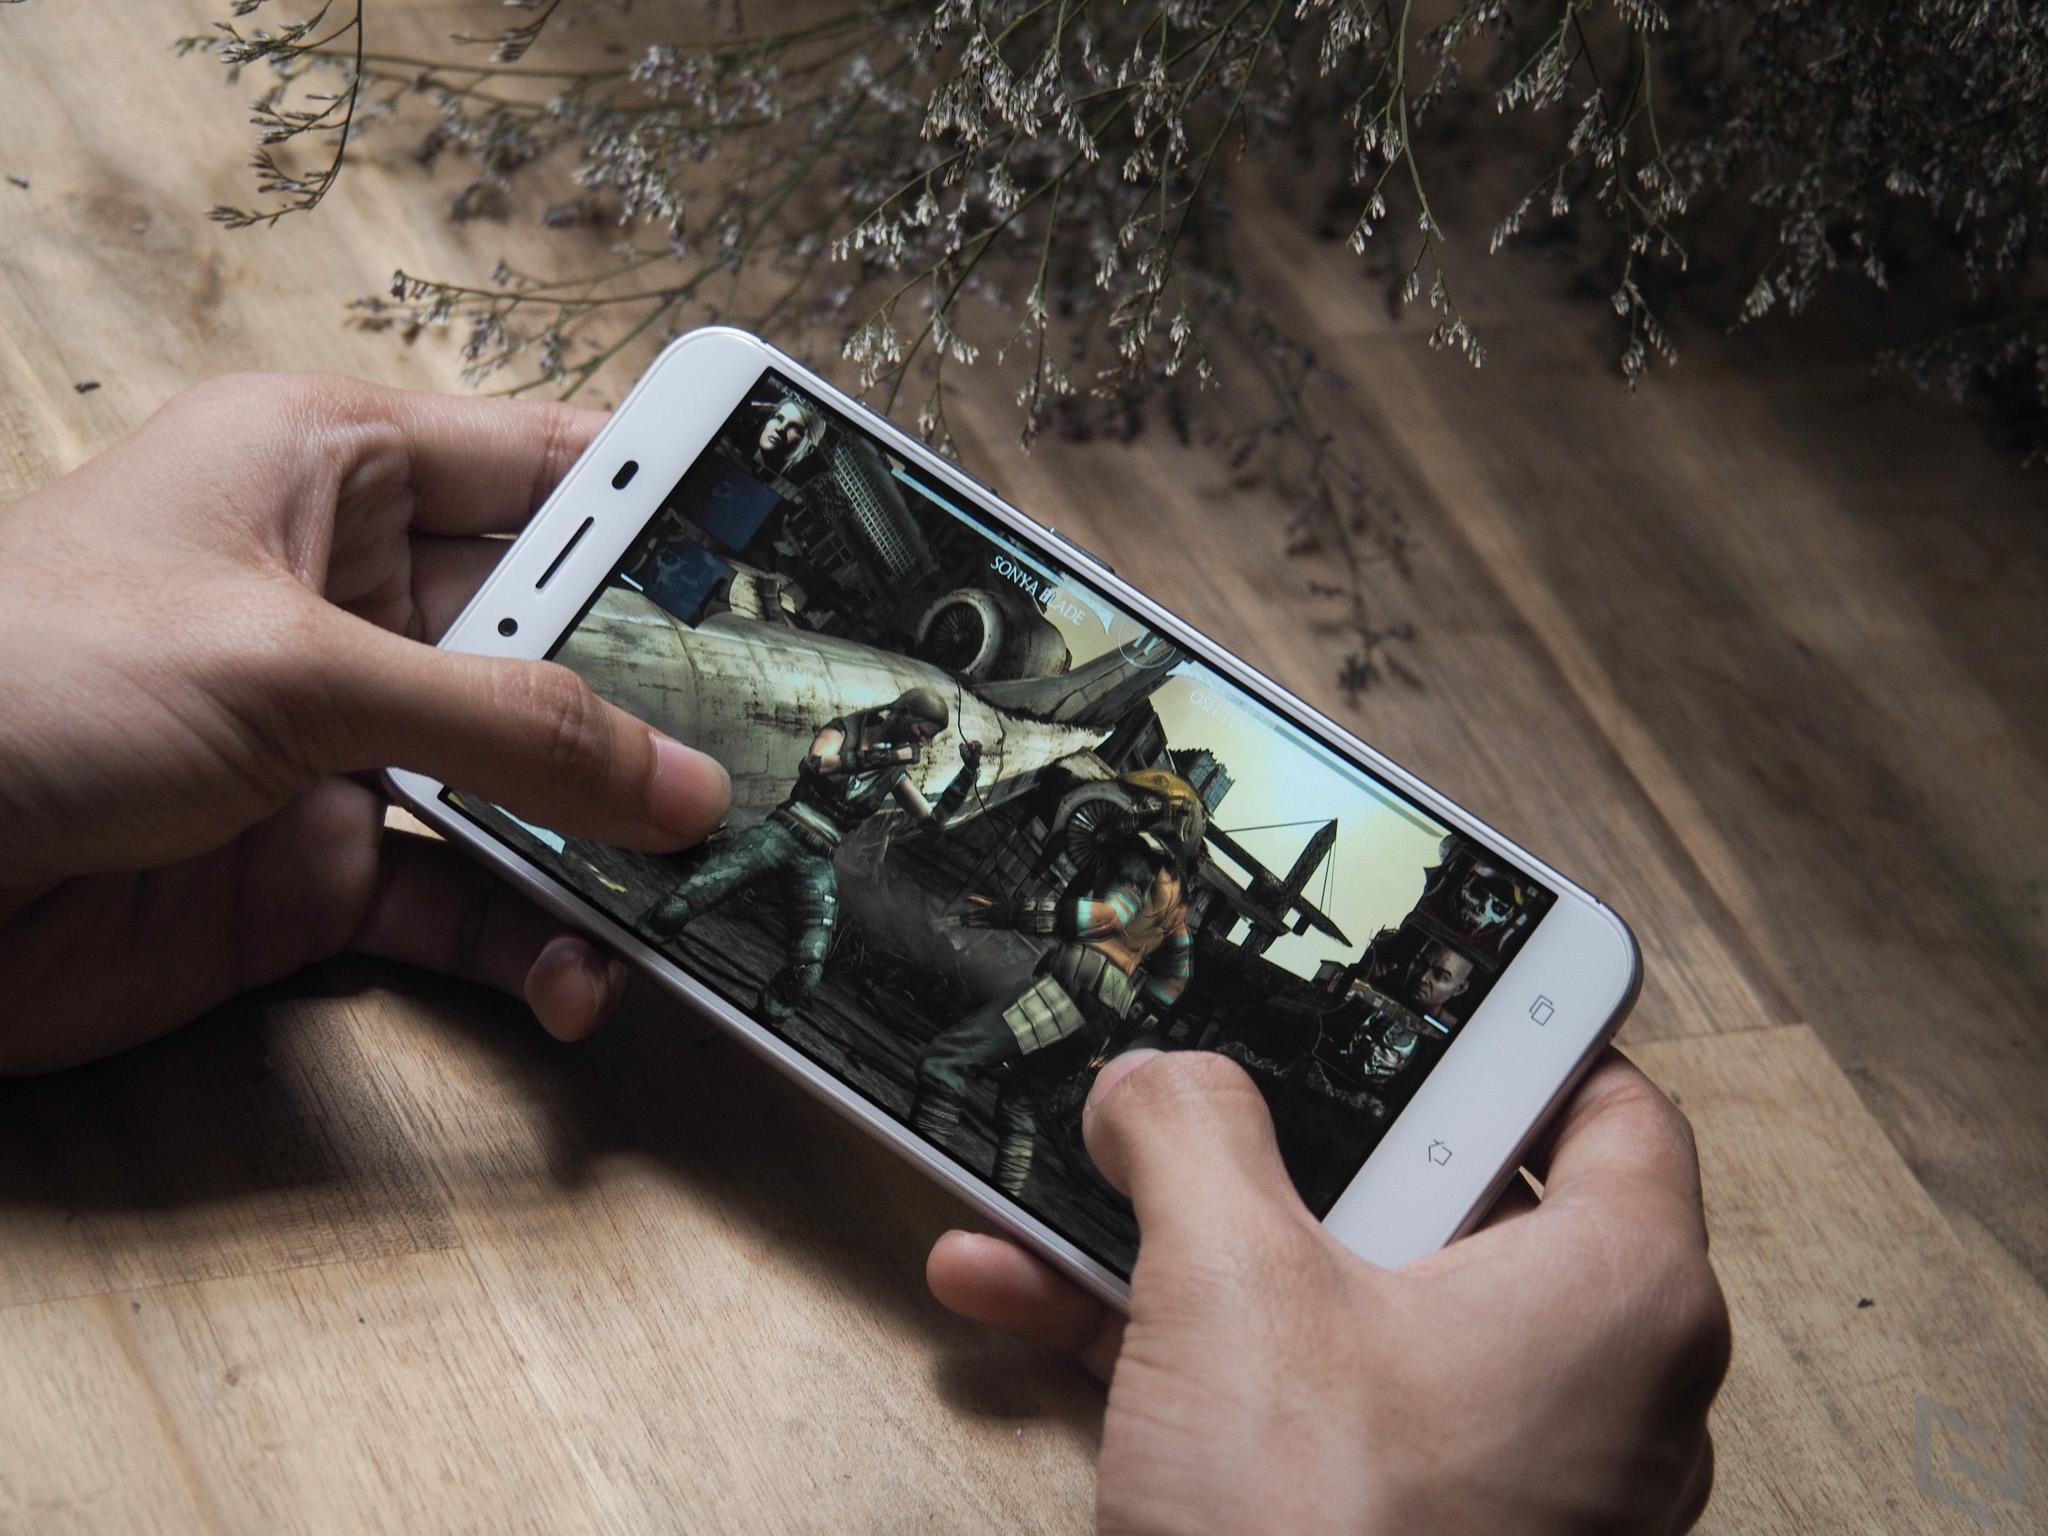 Đánh giá ZenFone 3 Max 5.5 inch